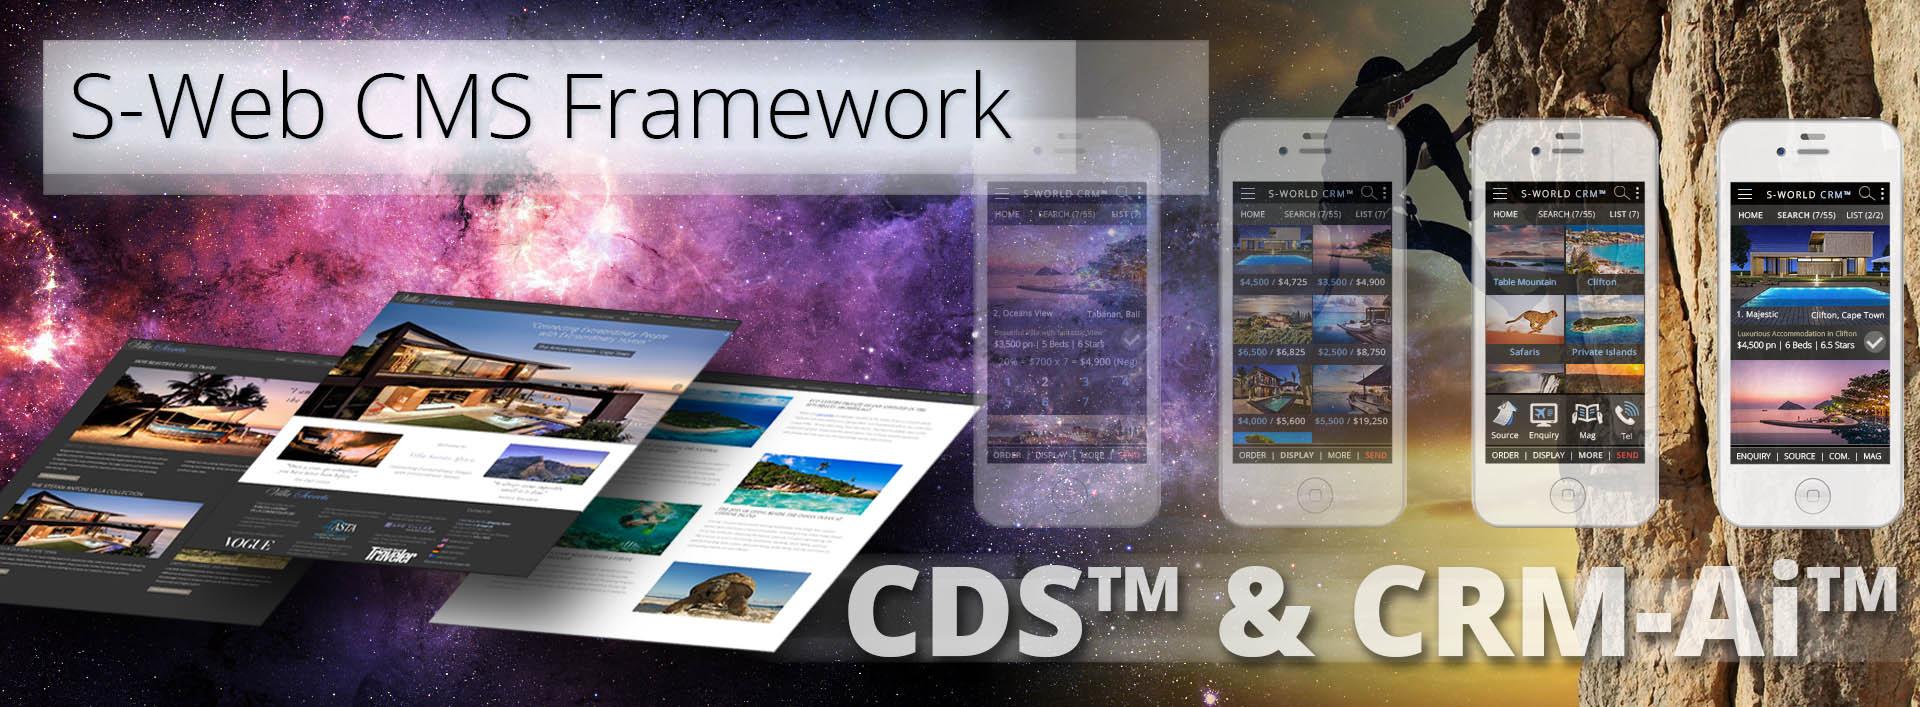 S-Web CMS Framework-CDS & CRM